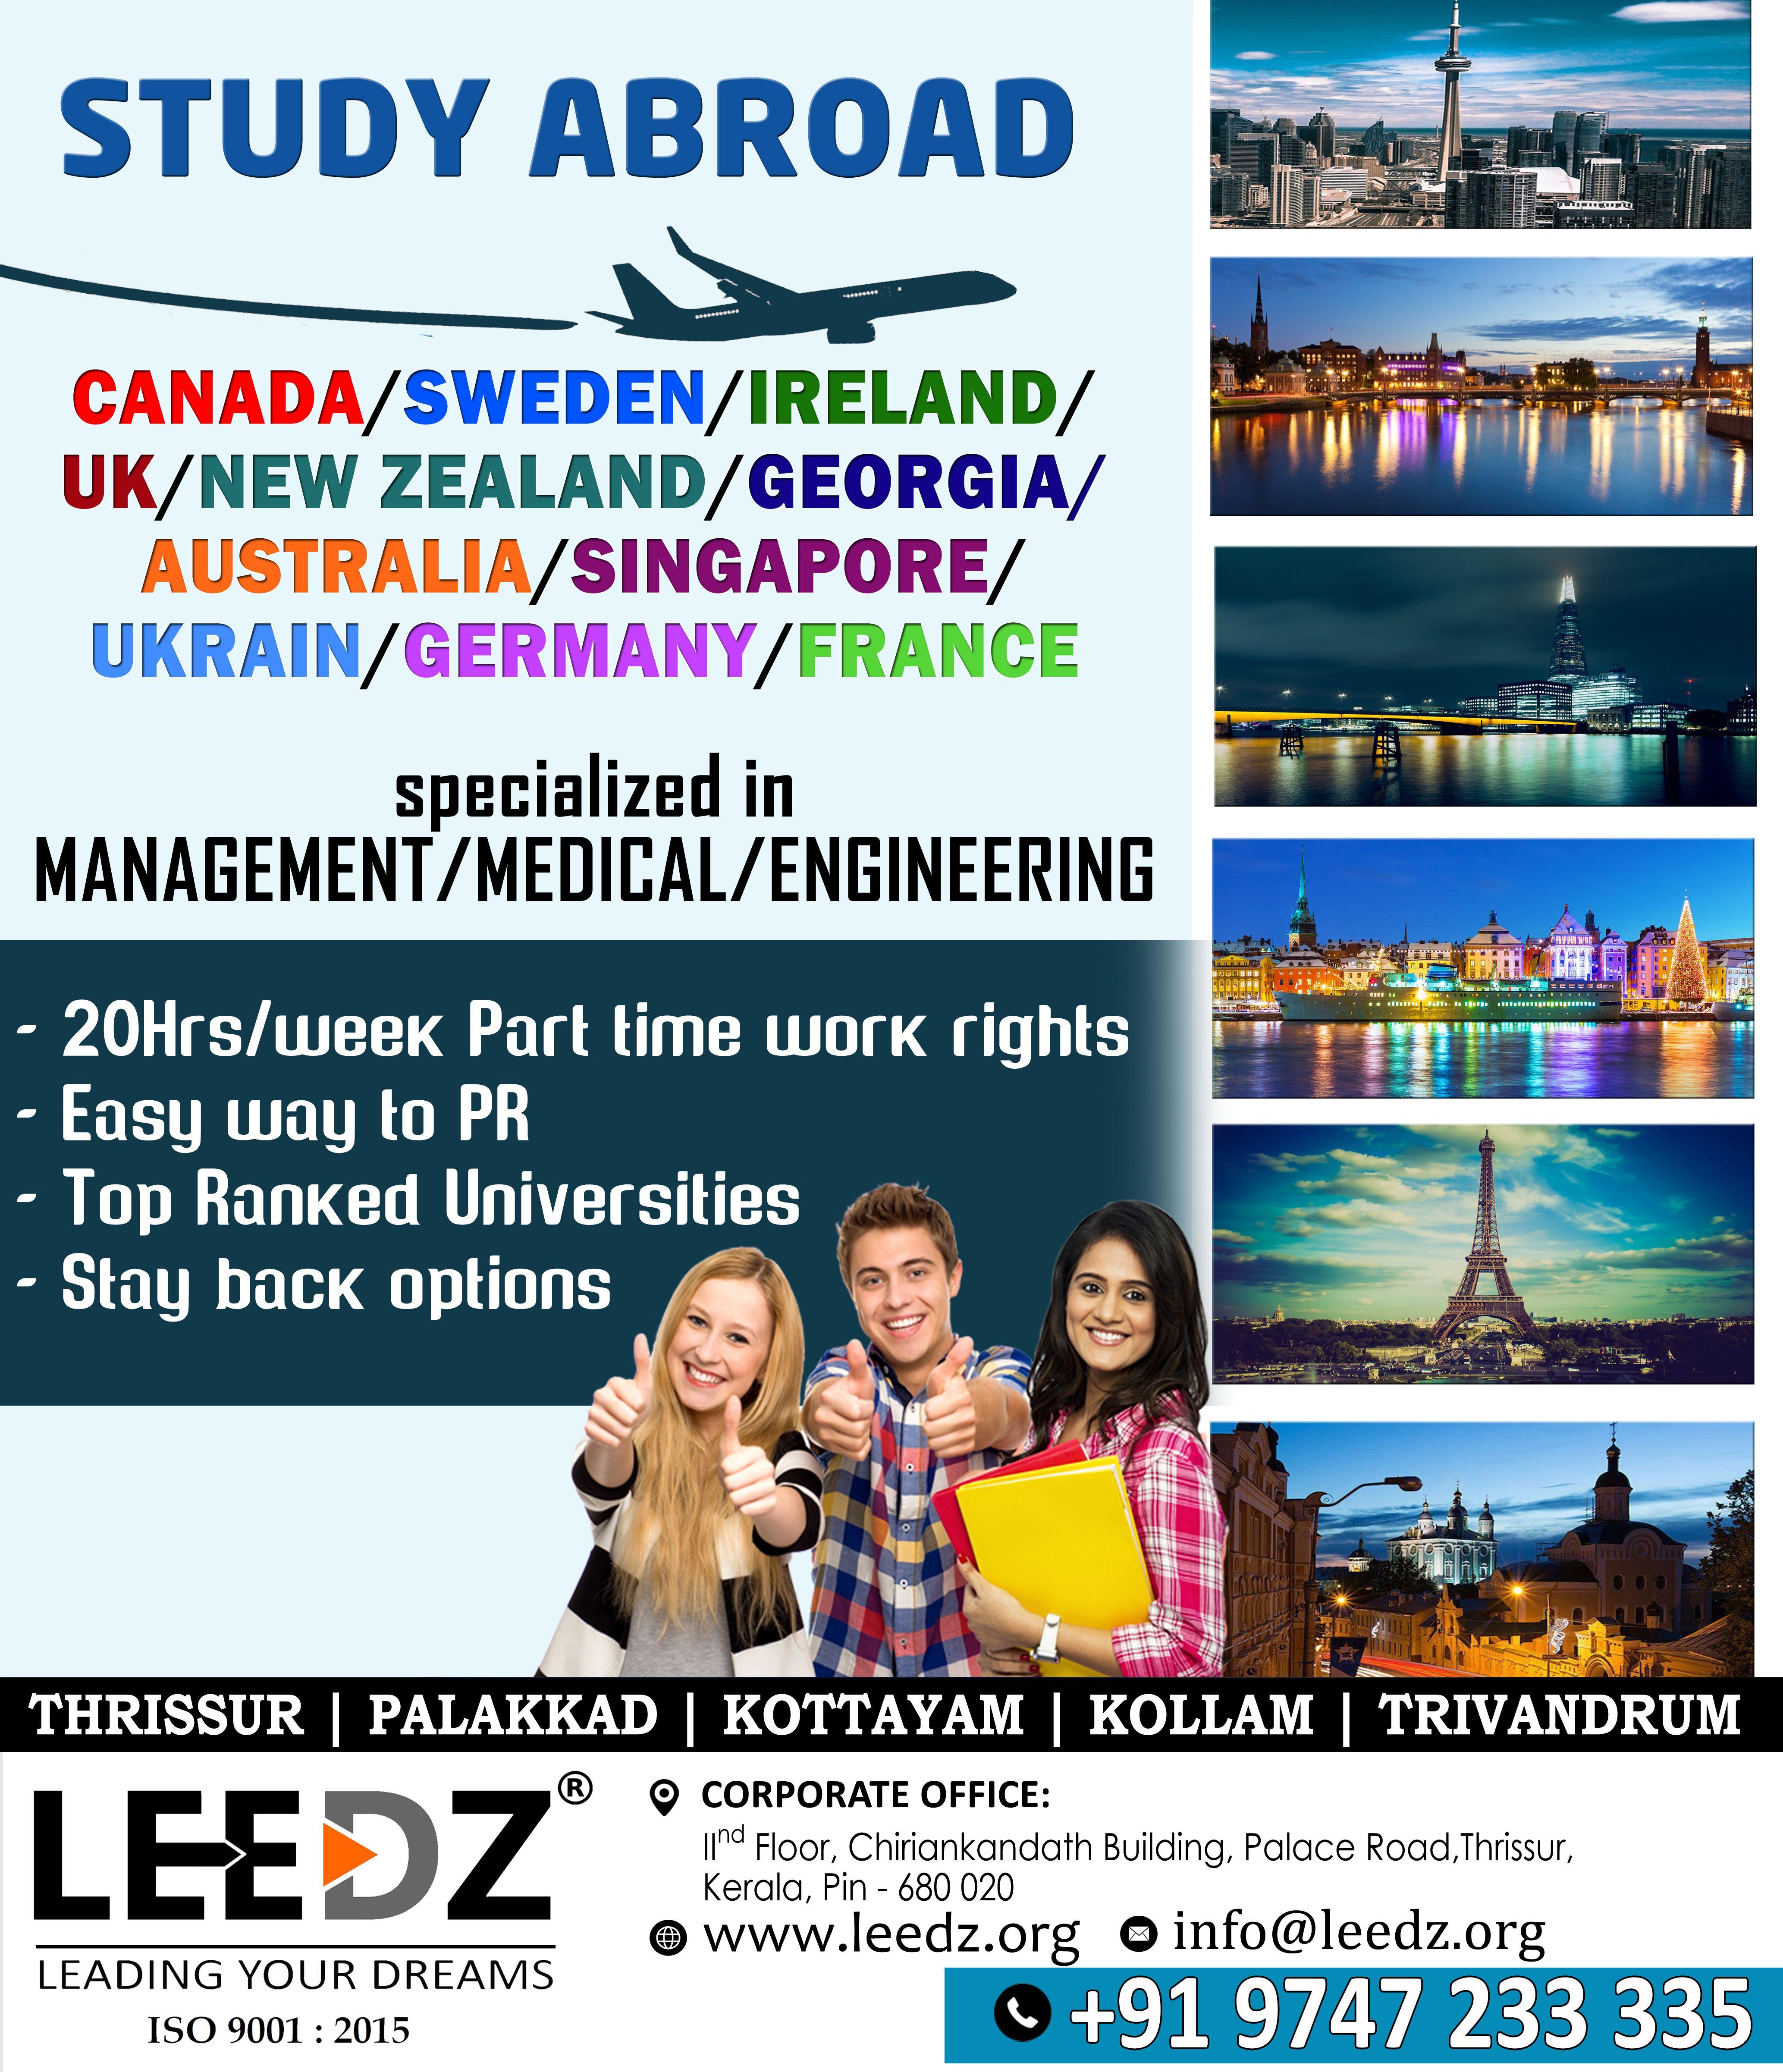 Leedz offers service in overseas education. we provide